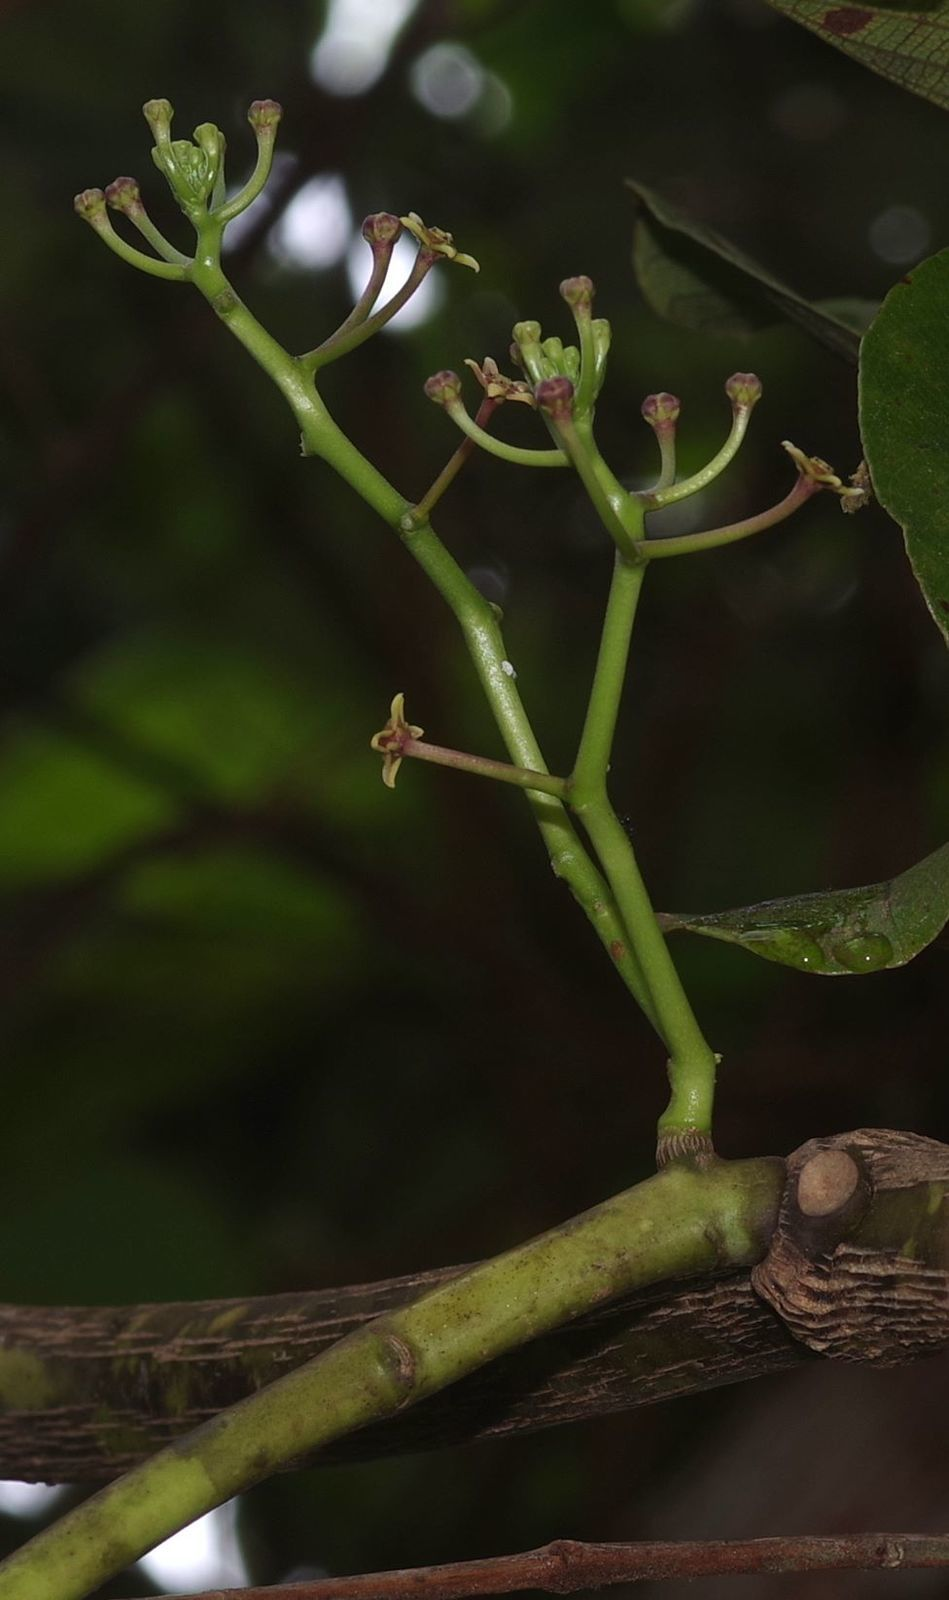 Cynanchum gilbertii